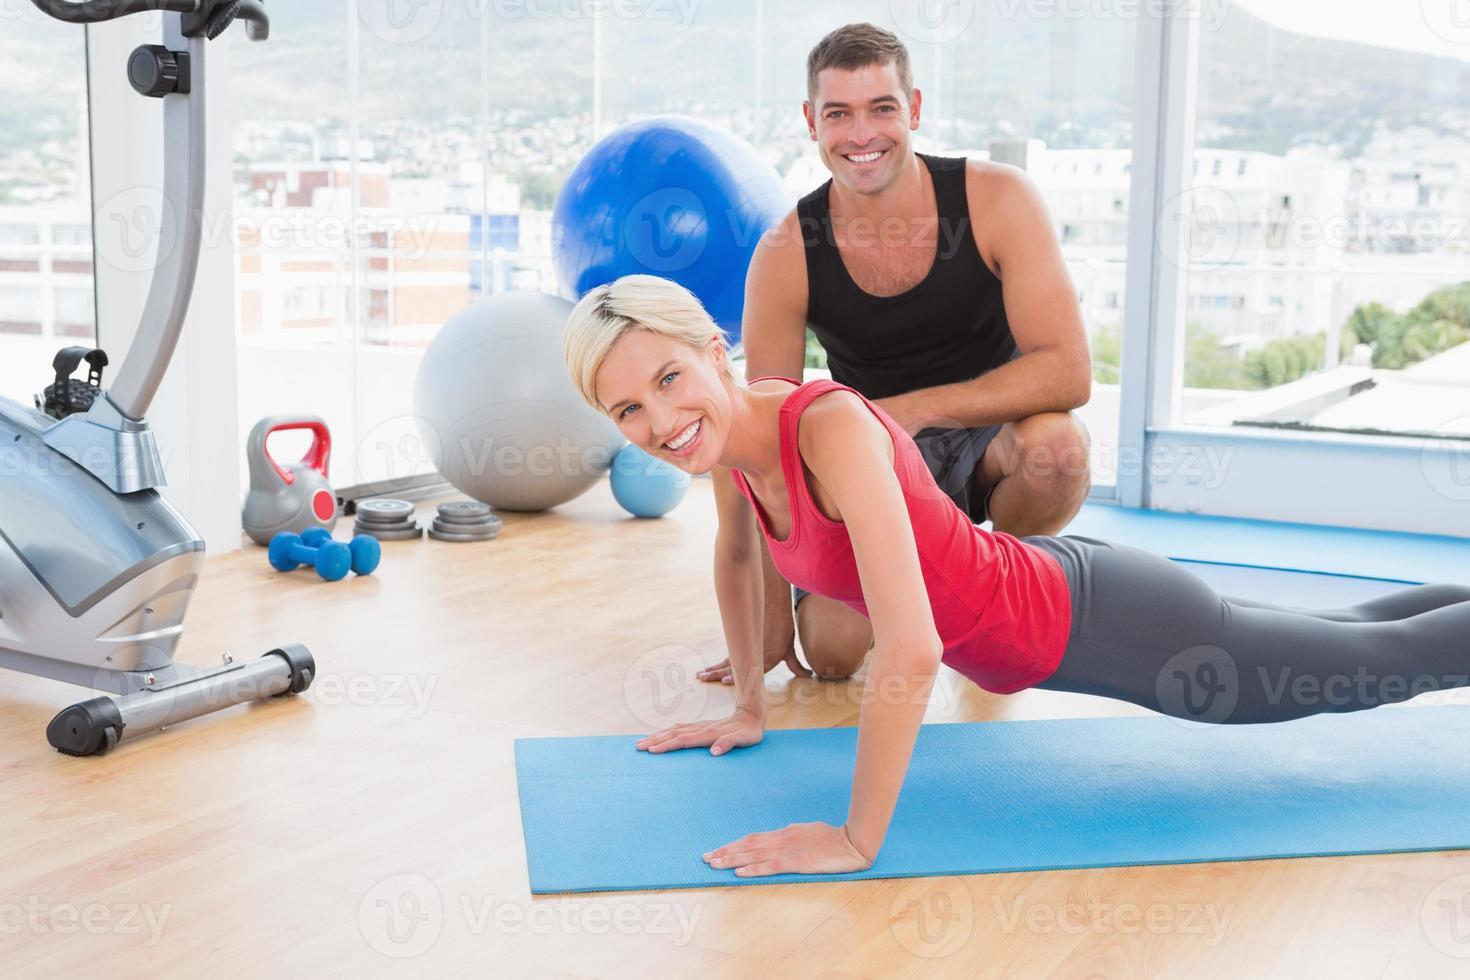 blonde vrouw die aan oefeningsmat werkt met haar trainer foto